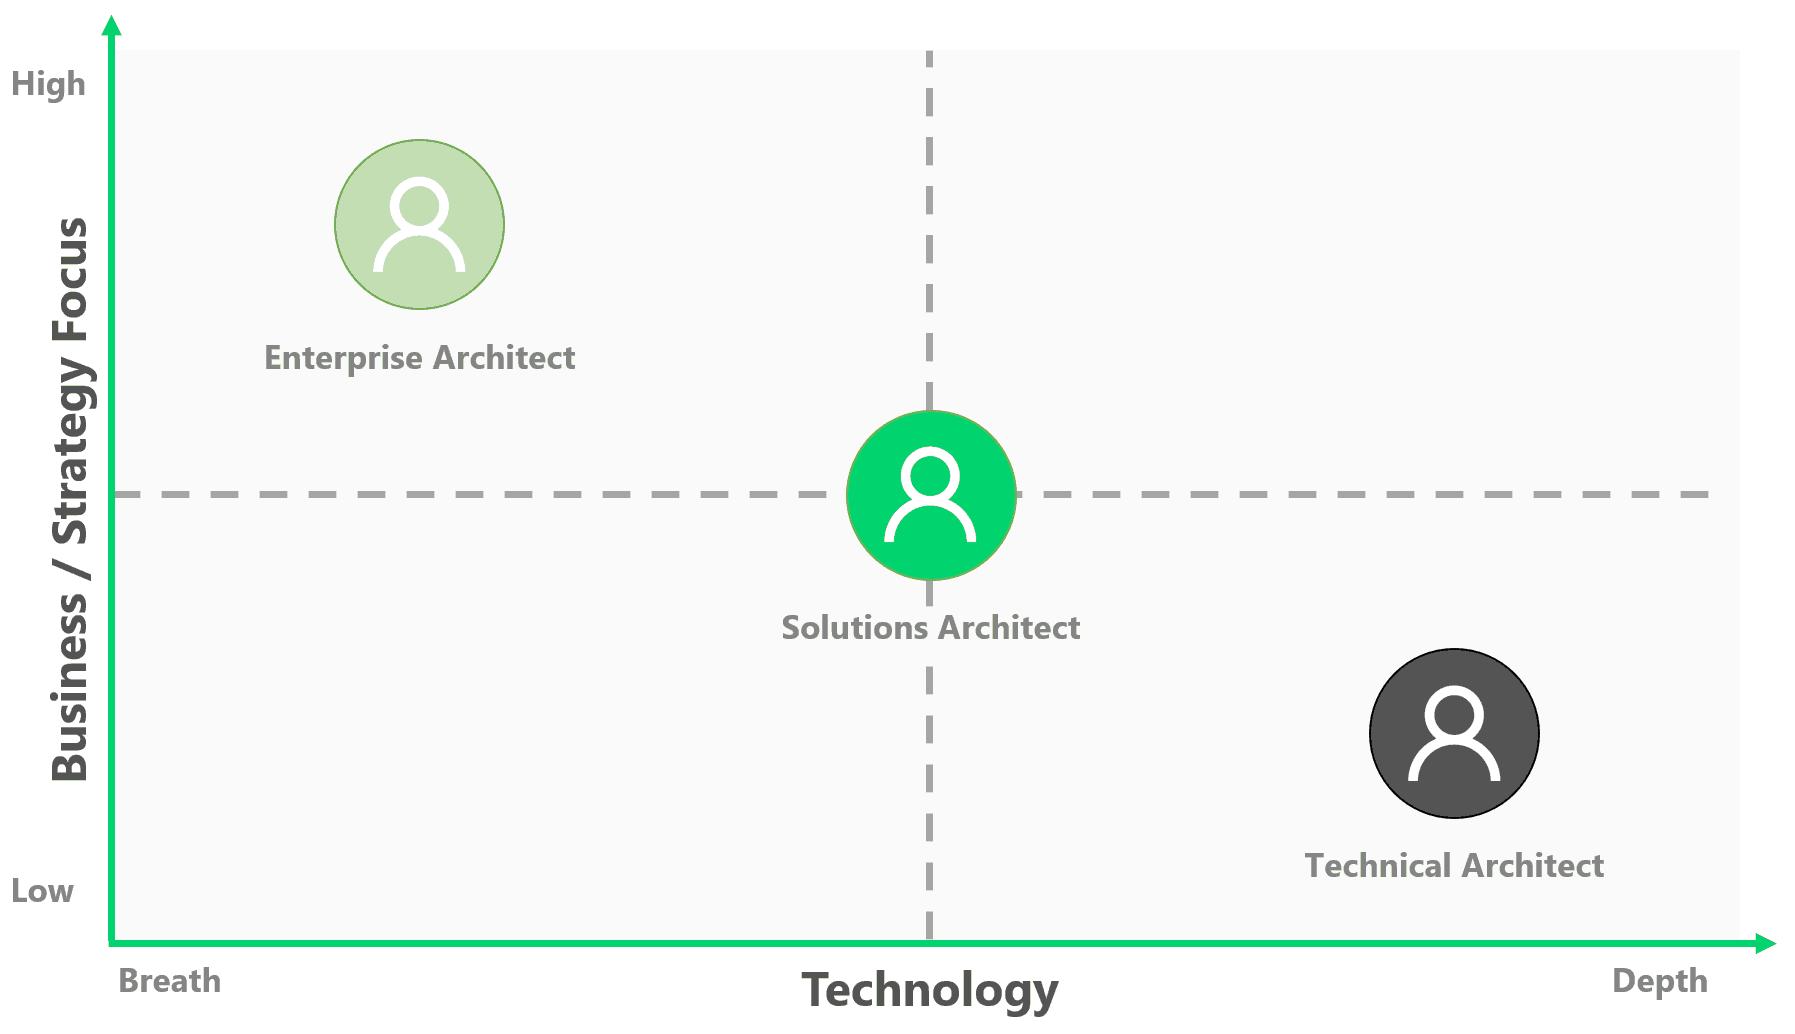 Architect Job Focus Business Breath Technical Depth